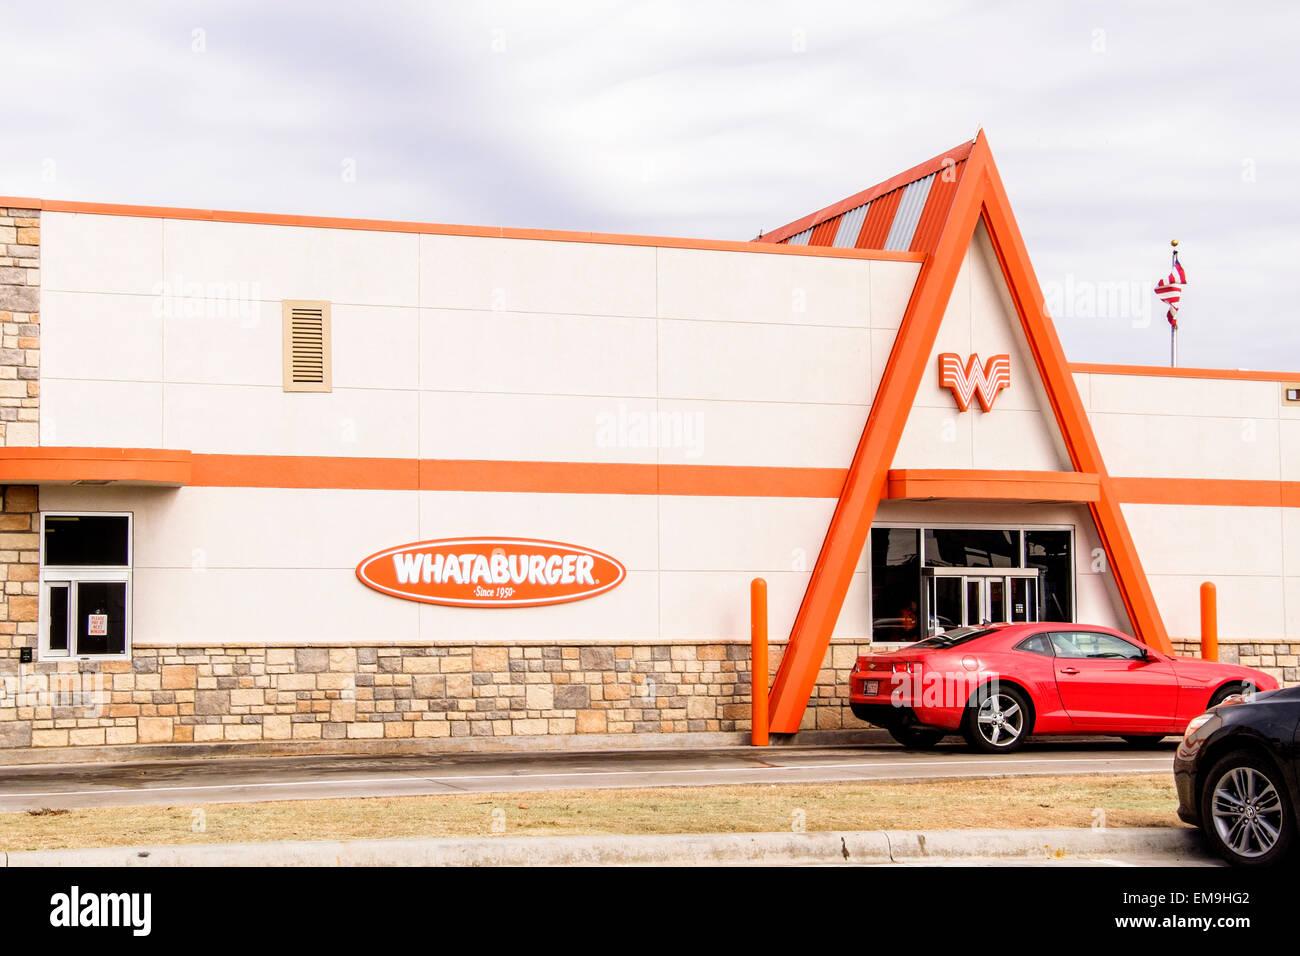 The Front Exterior Of A Whataburger Franchise Hamburger Restaurant